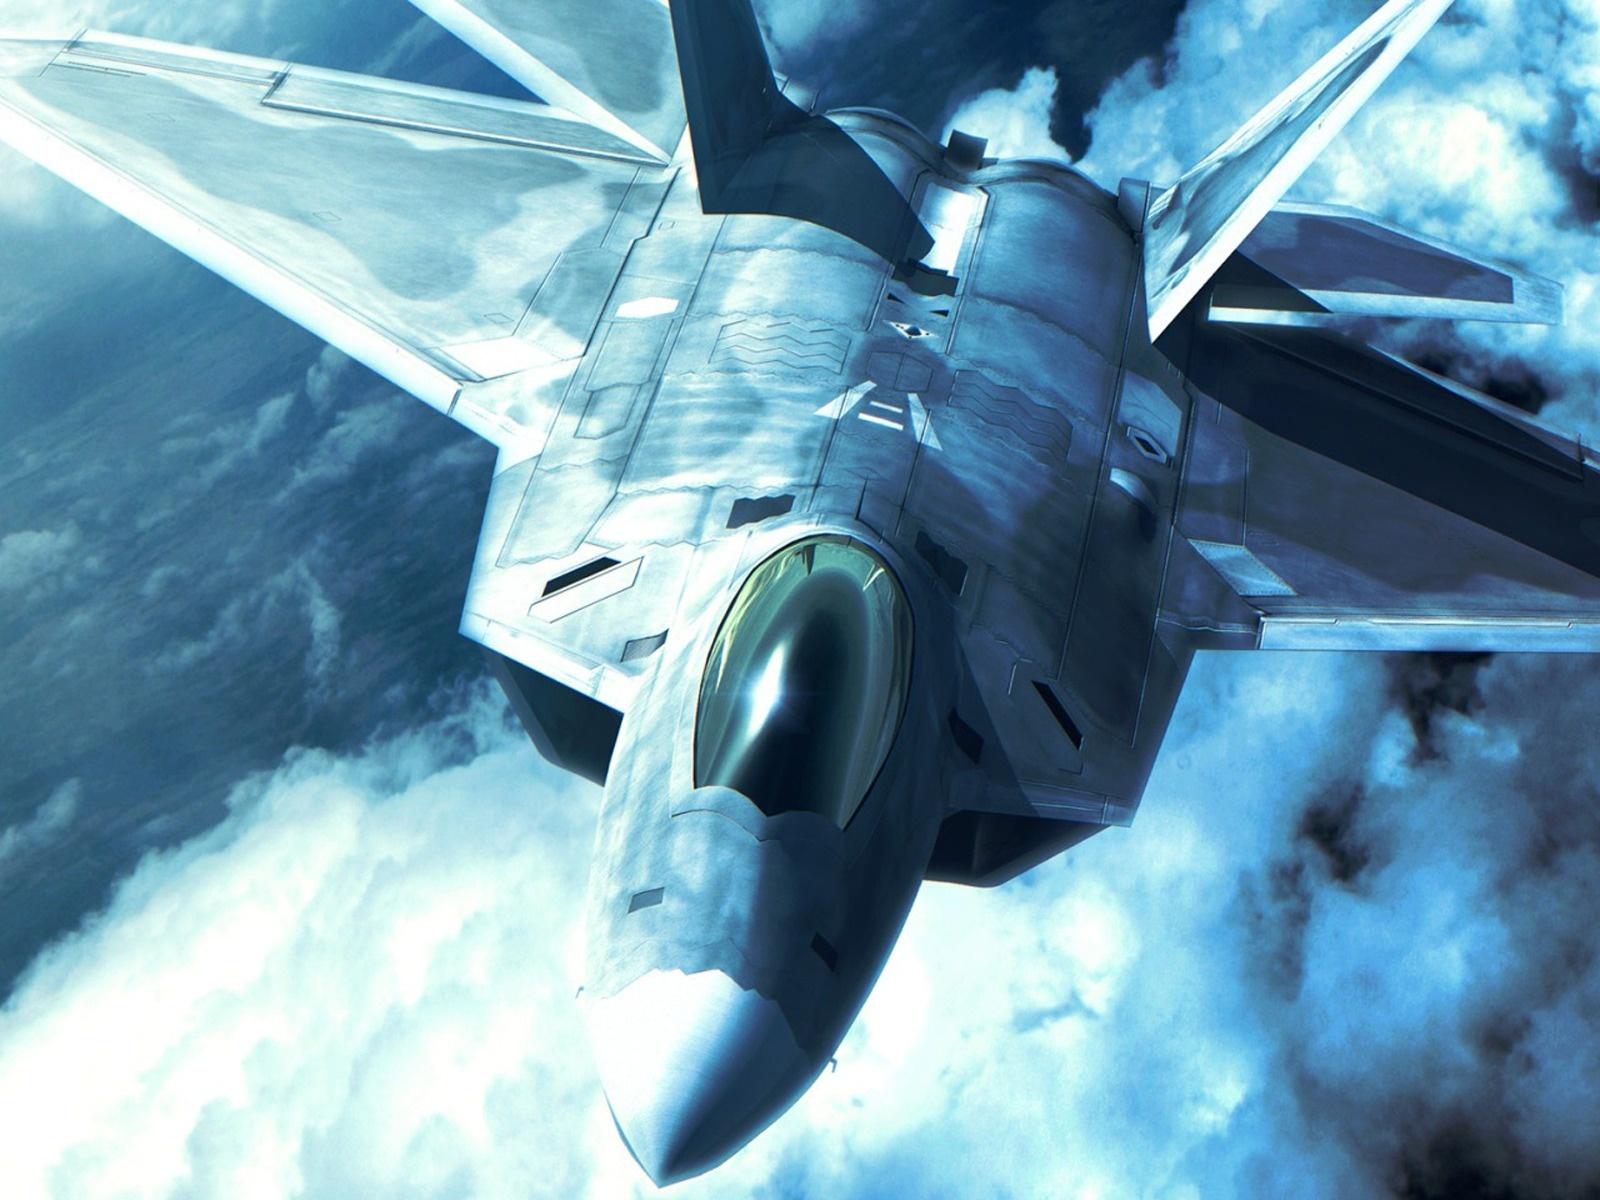 F-22 Raptor Jet Fighter HD Wallpapers | Desktop Wallpapers